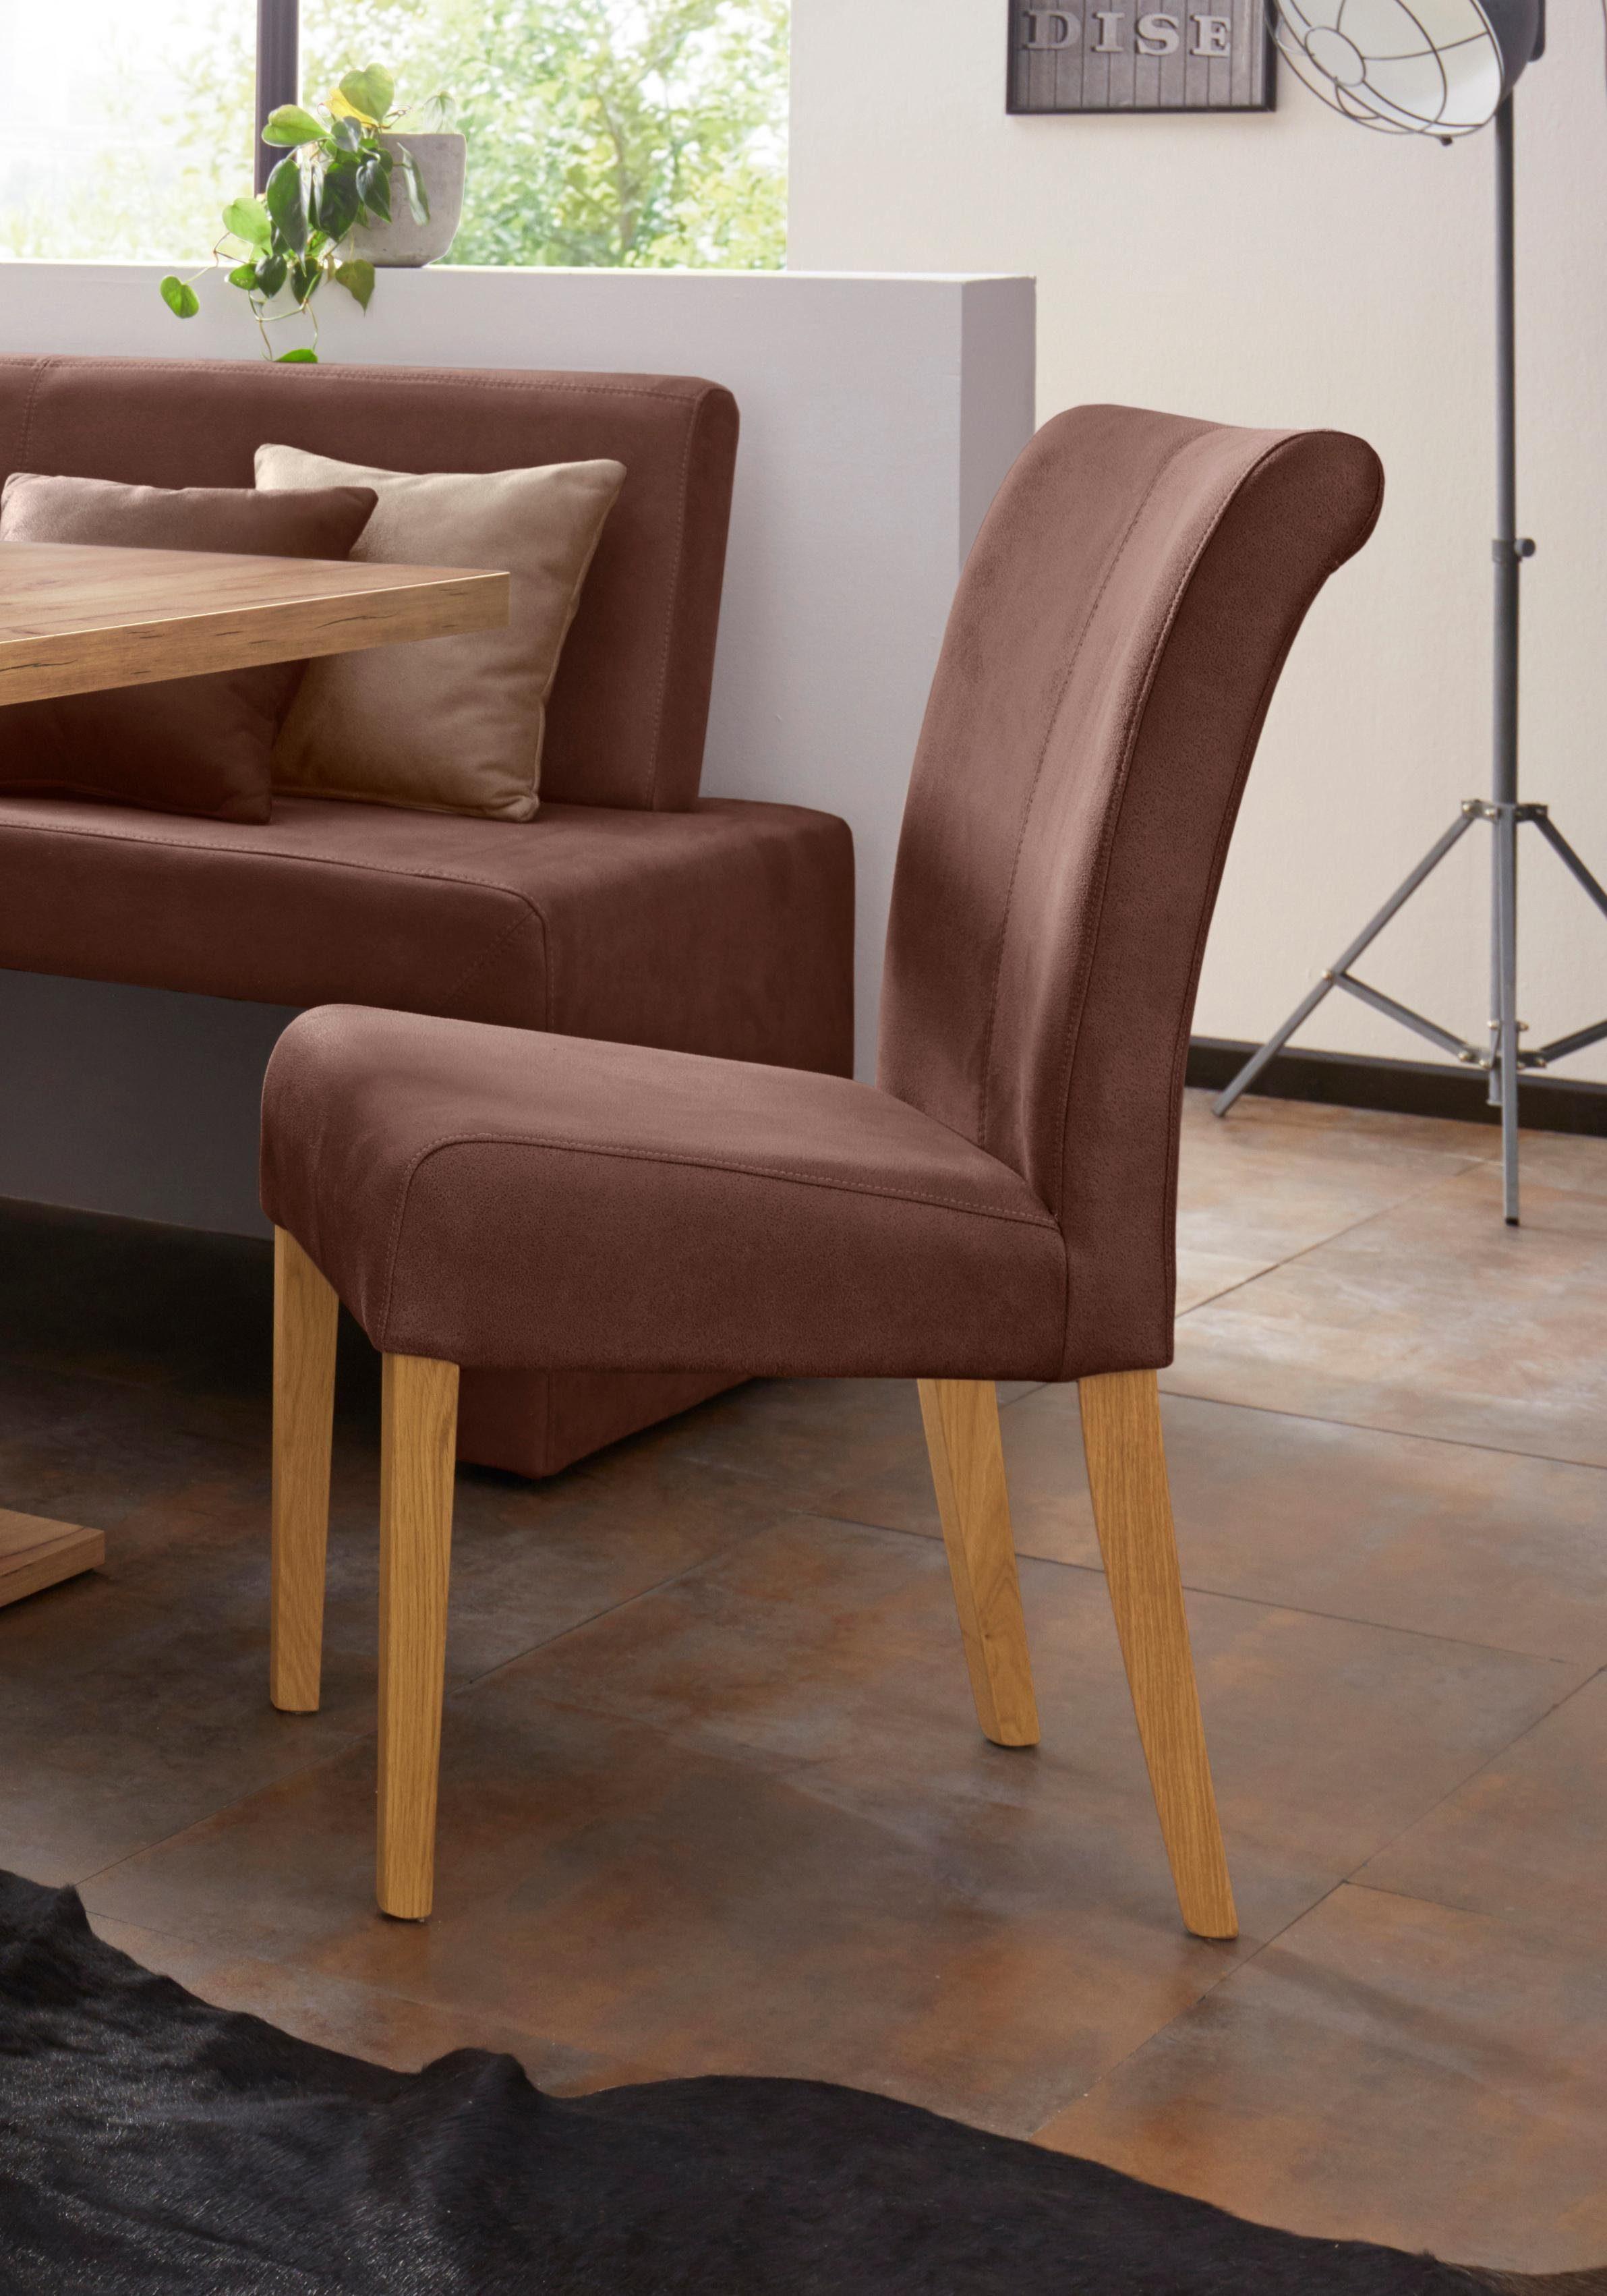 Stuhl »Barcelona«, Gestell aus Massivholz online kaufen   OTTO